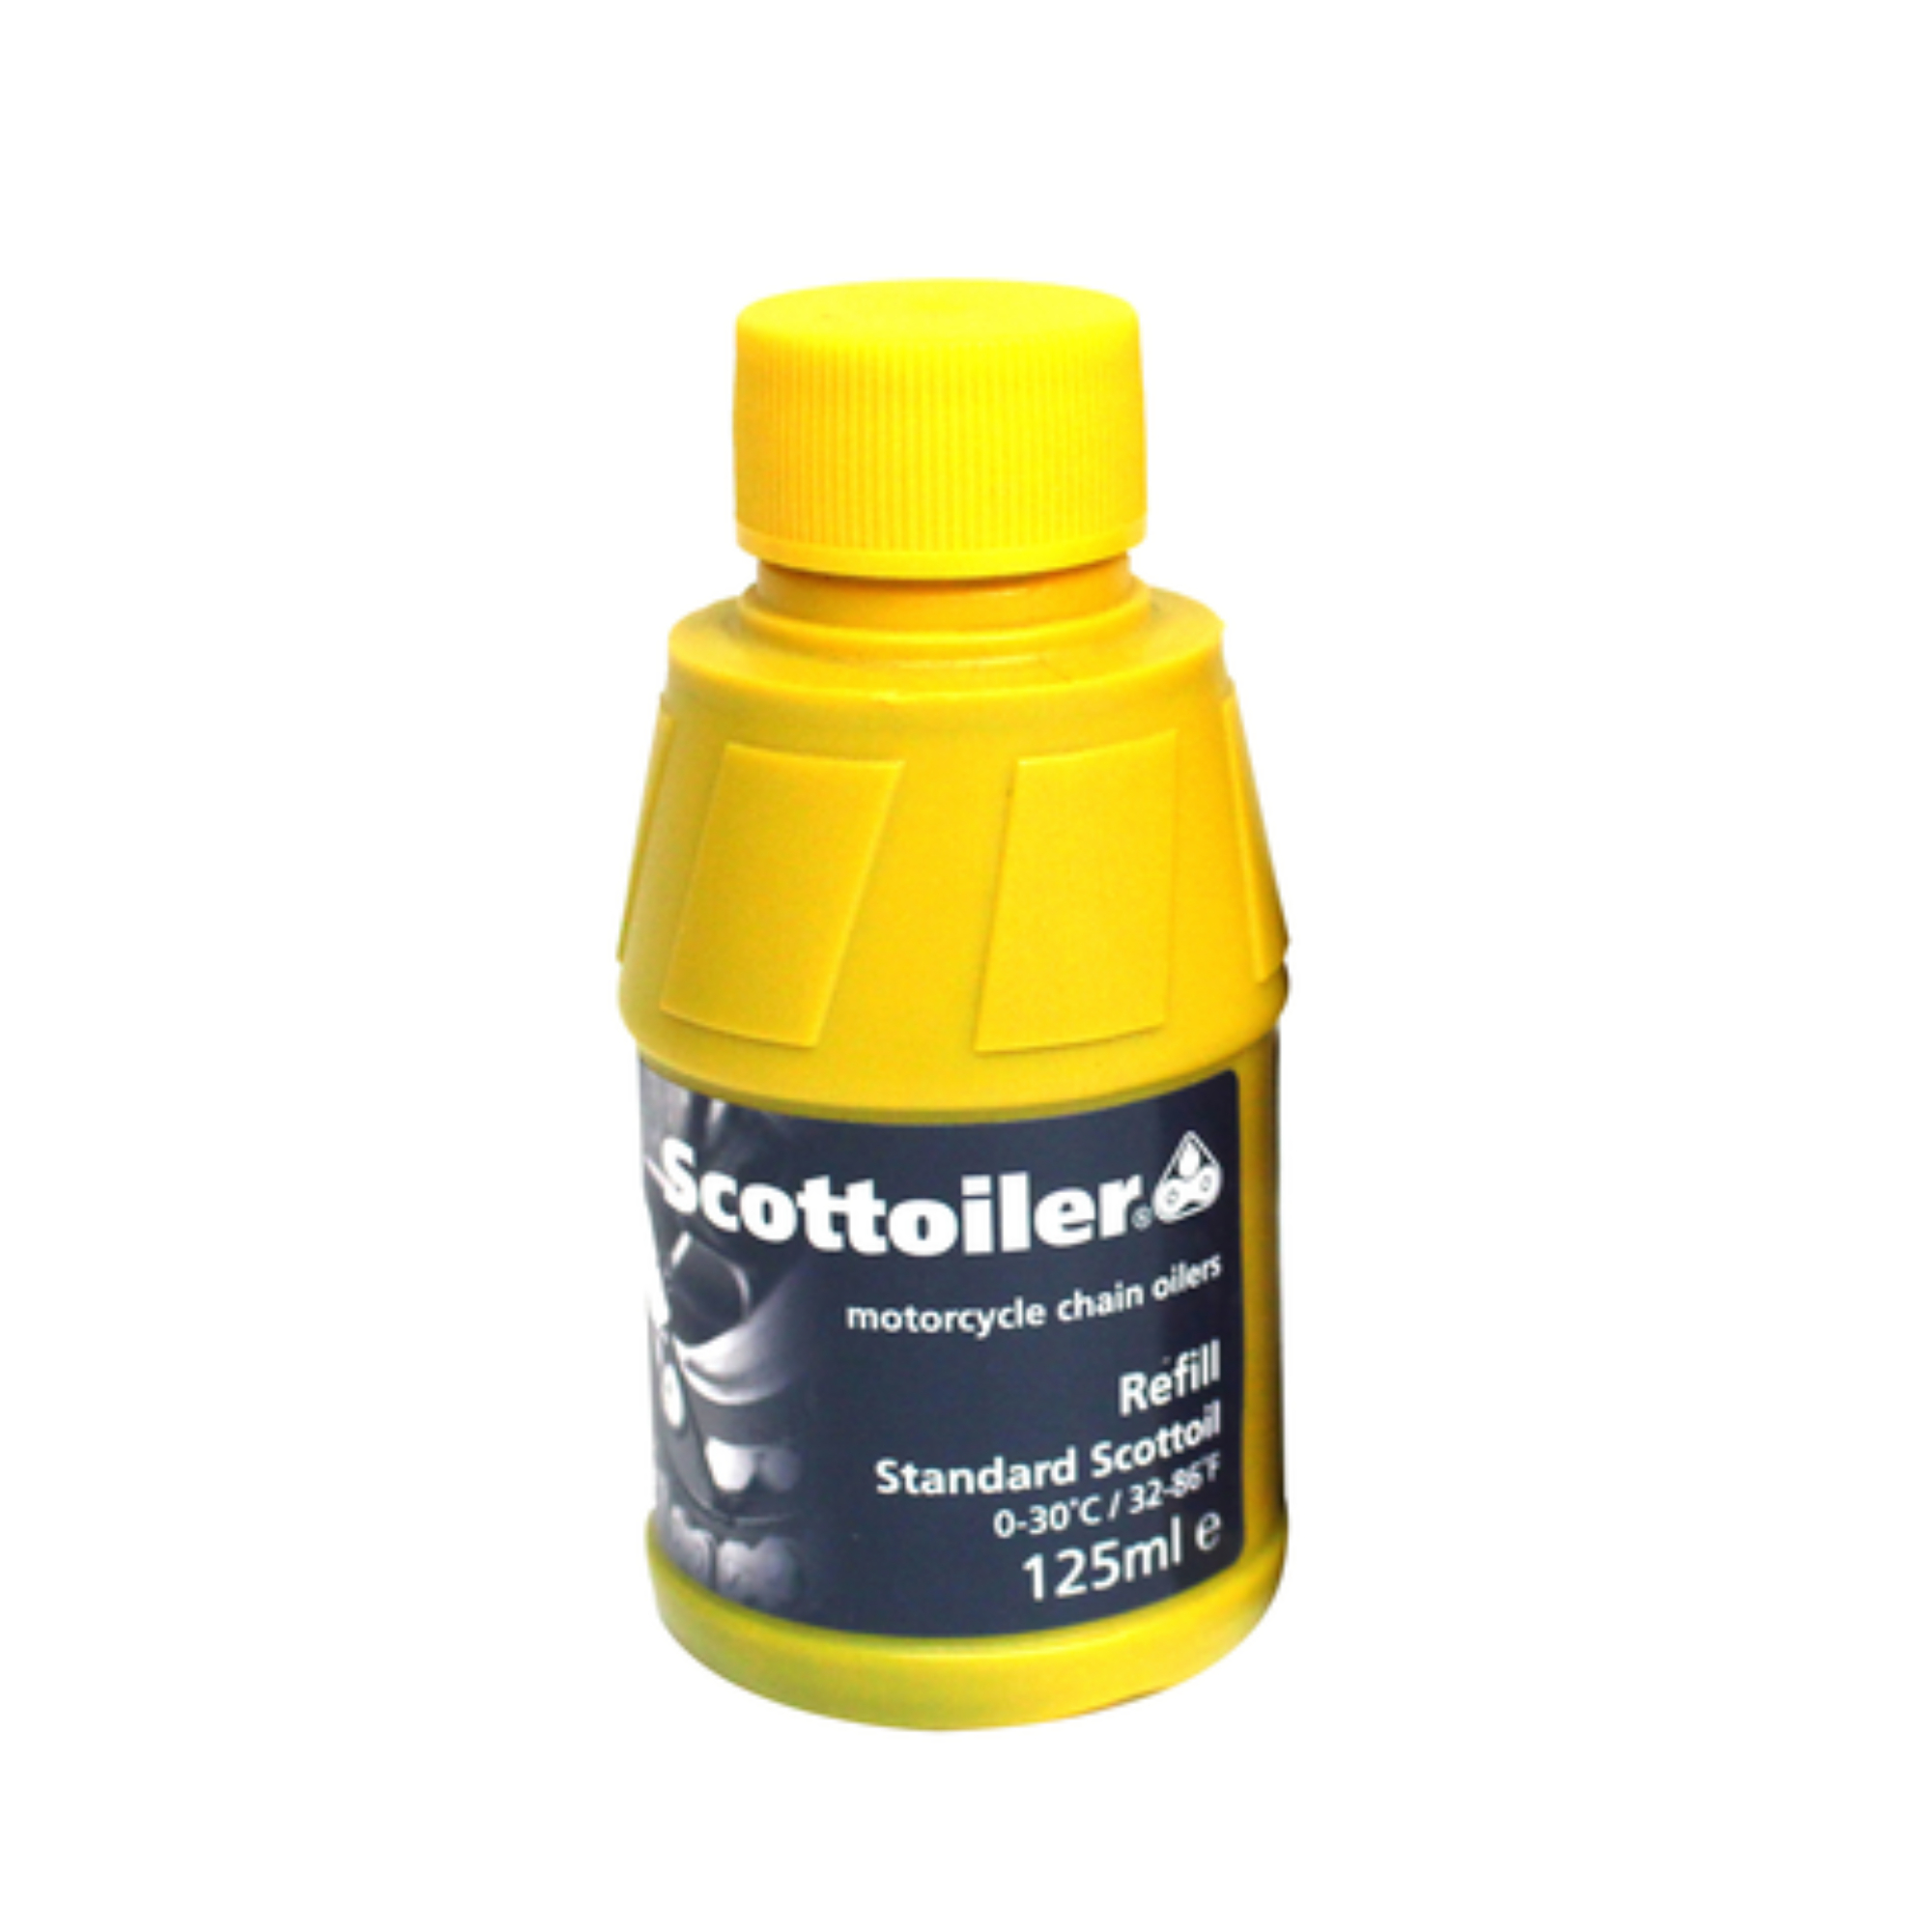 Scottoiler-Motorcycle-Bike-Traditional-Top-Up-Oil-Bottle-125ml